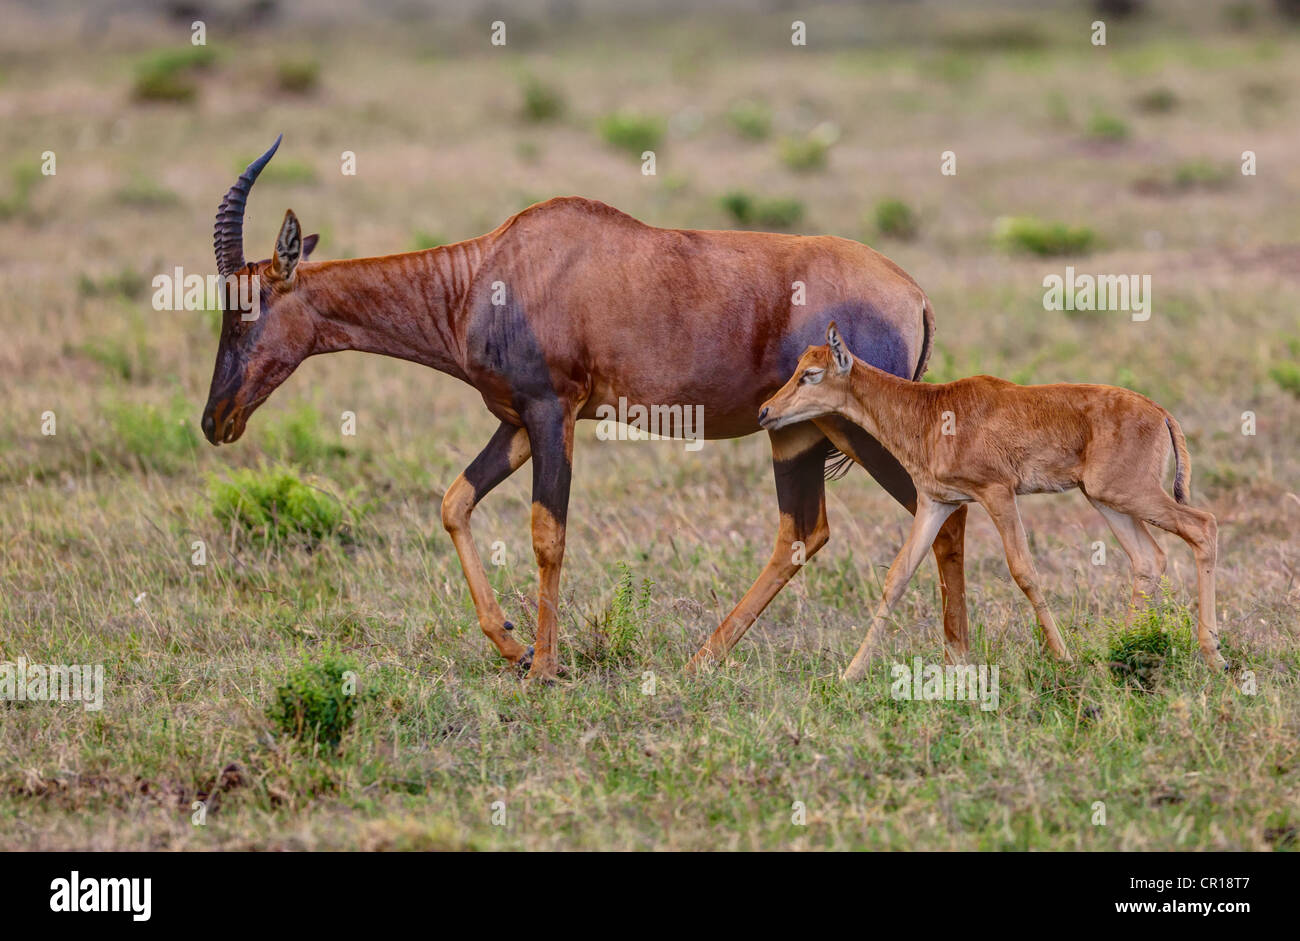 Topi Antelope (Damaliscus lunatus) with young, Masai Mara National Reserve, Kenya, East Africa, Africa, PublicGround - Stock Image